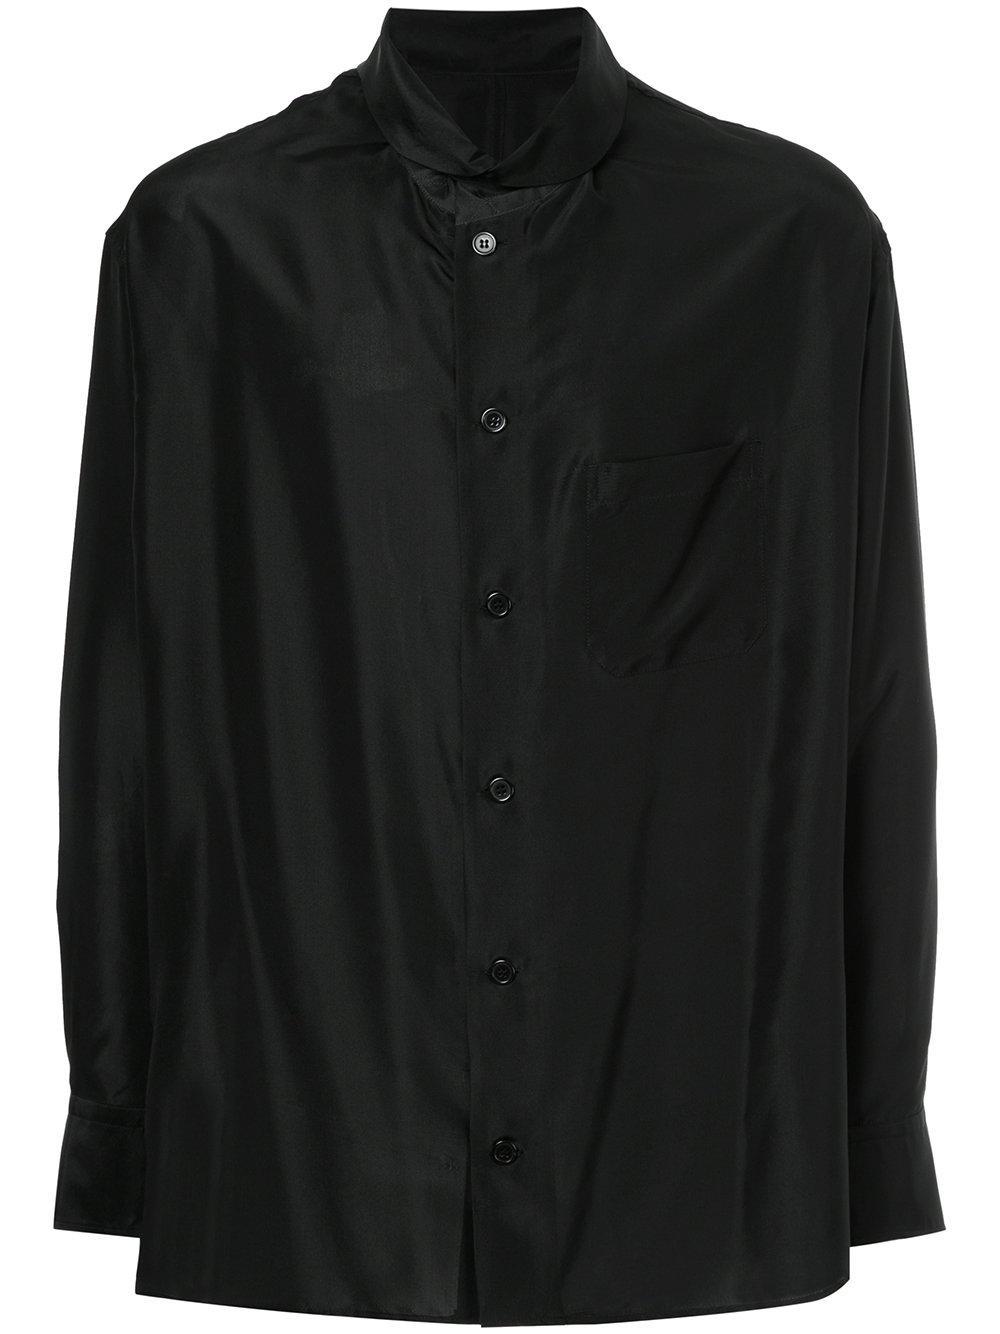 Yohji Yamamoto Round Neck Button Shirt